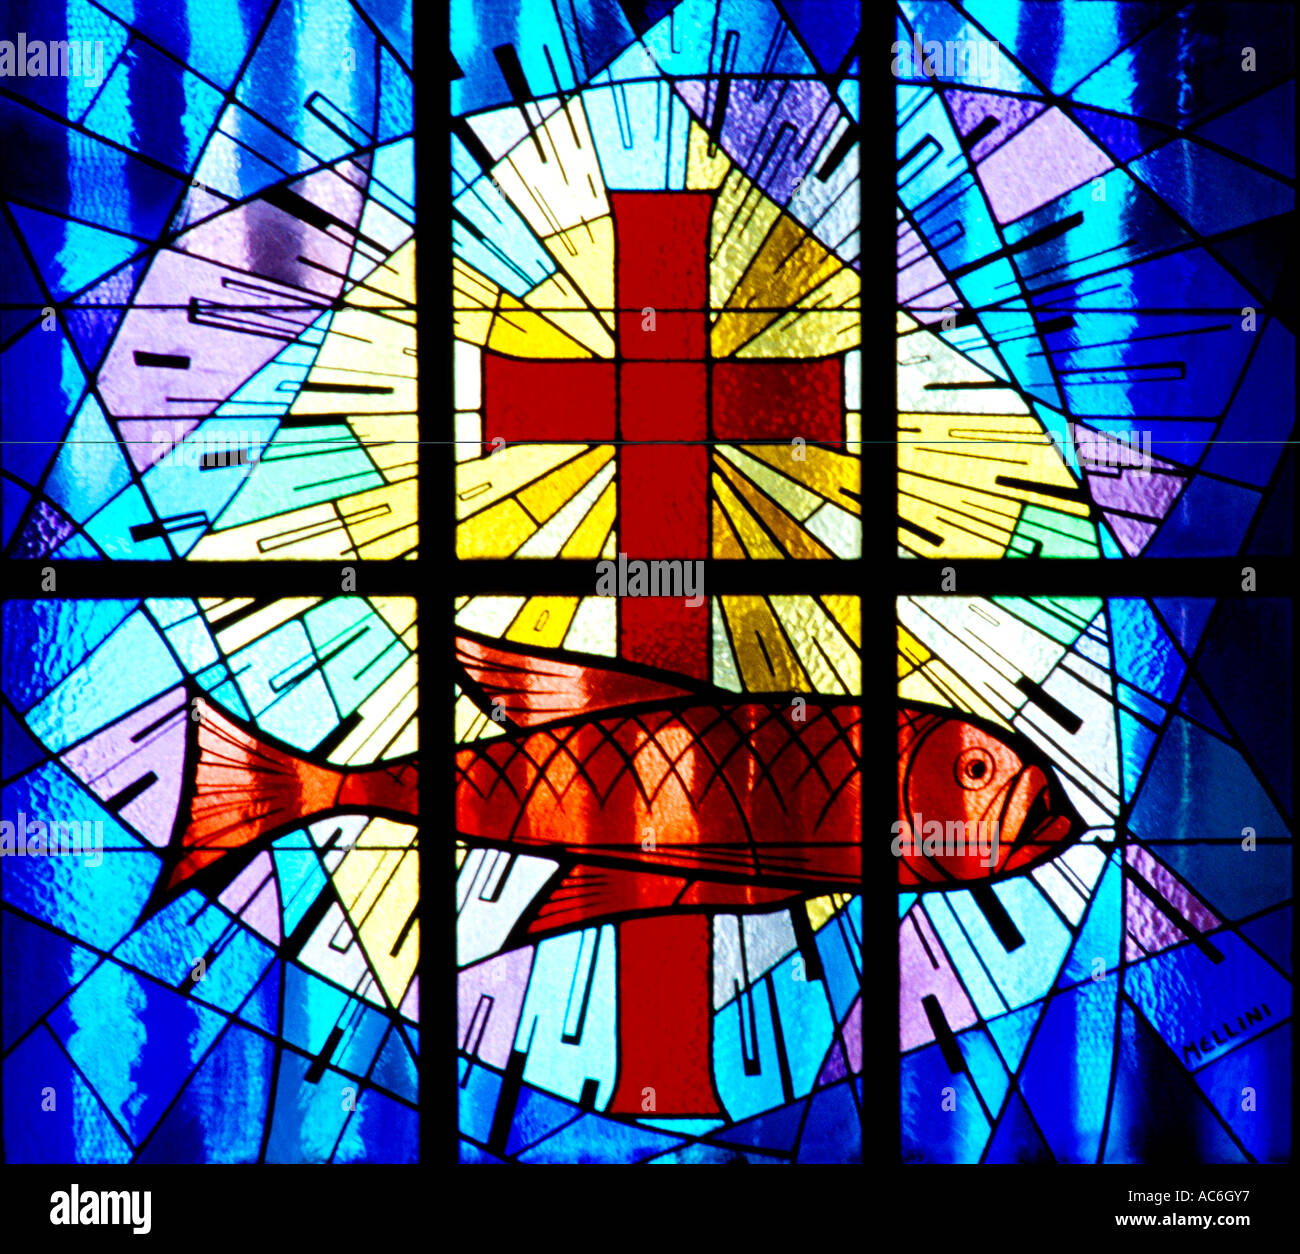 Glass Fish Church Window Stock Photos & Glass Fish Church Window ...